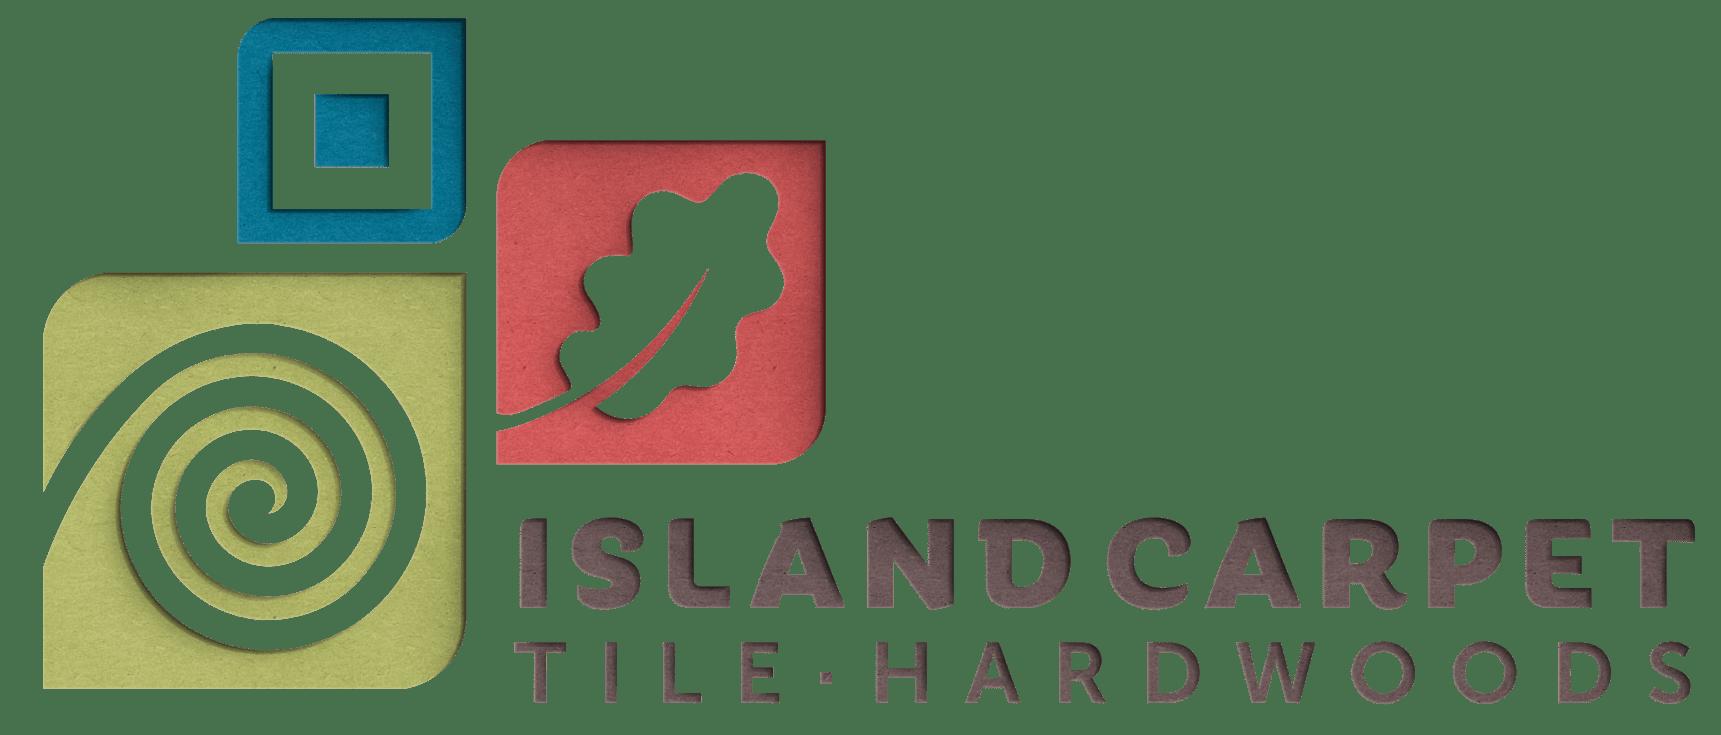 Island Carpet